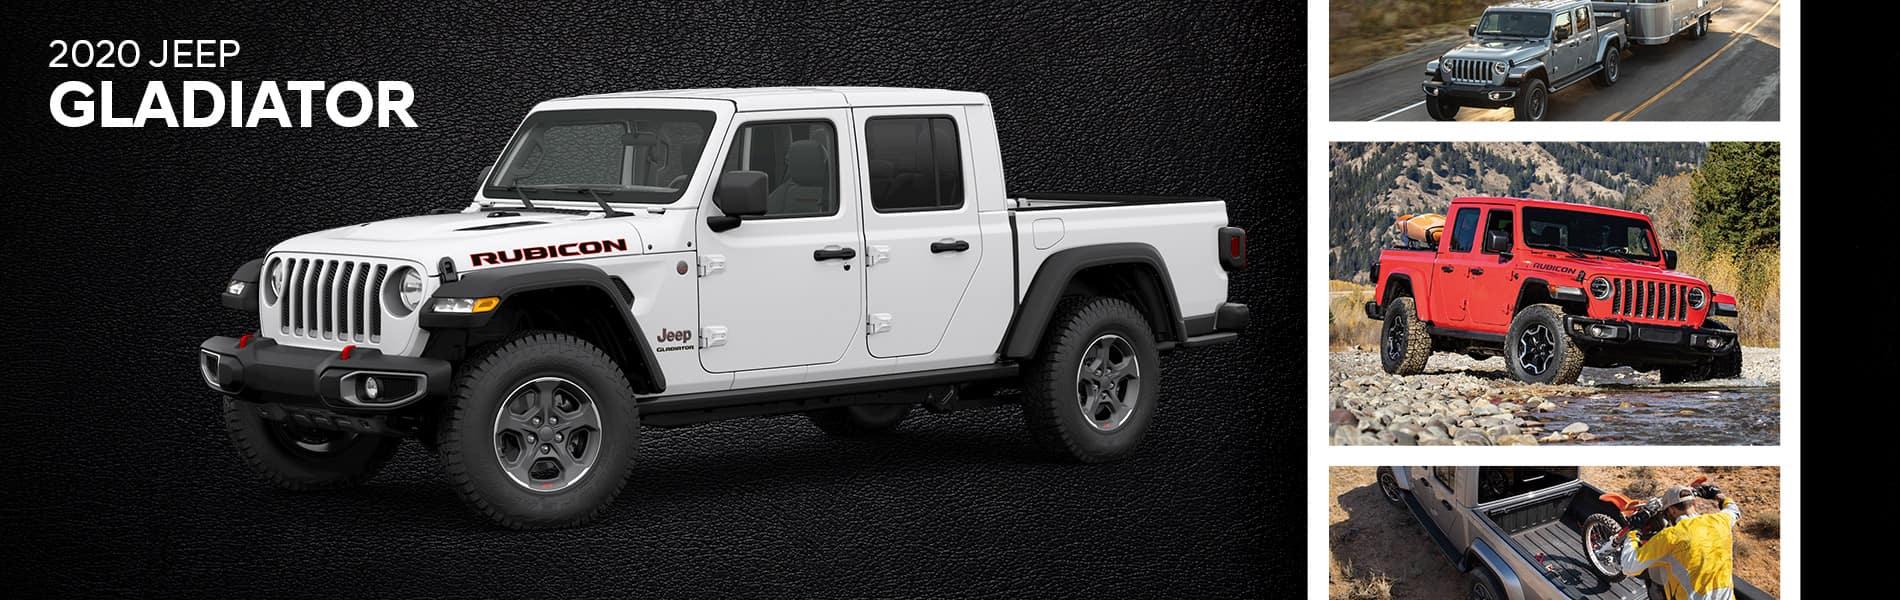 2020 Jeep Gladiator | Fort Wayne, IN